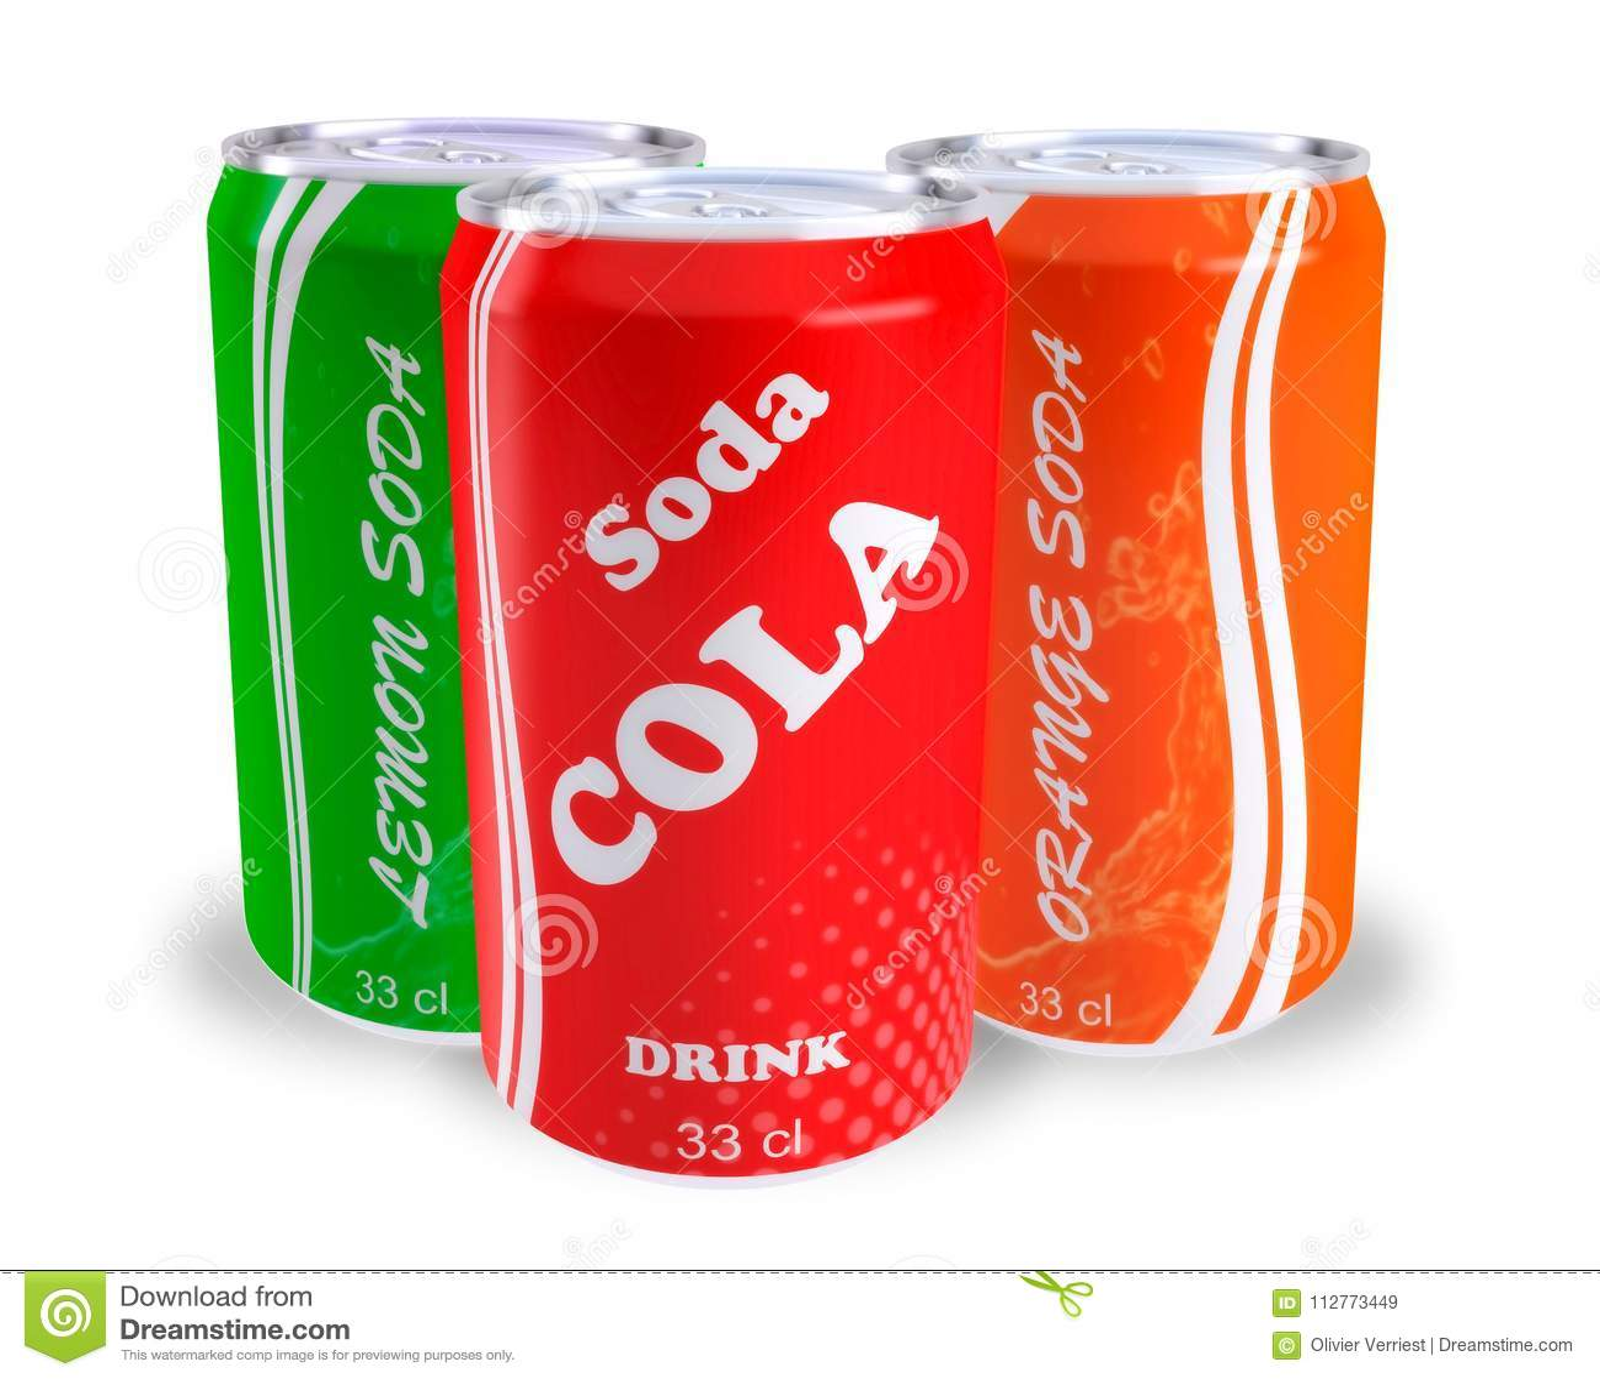 Cans soda cola orange lemon